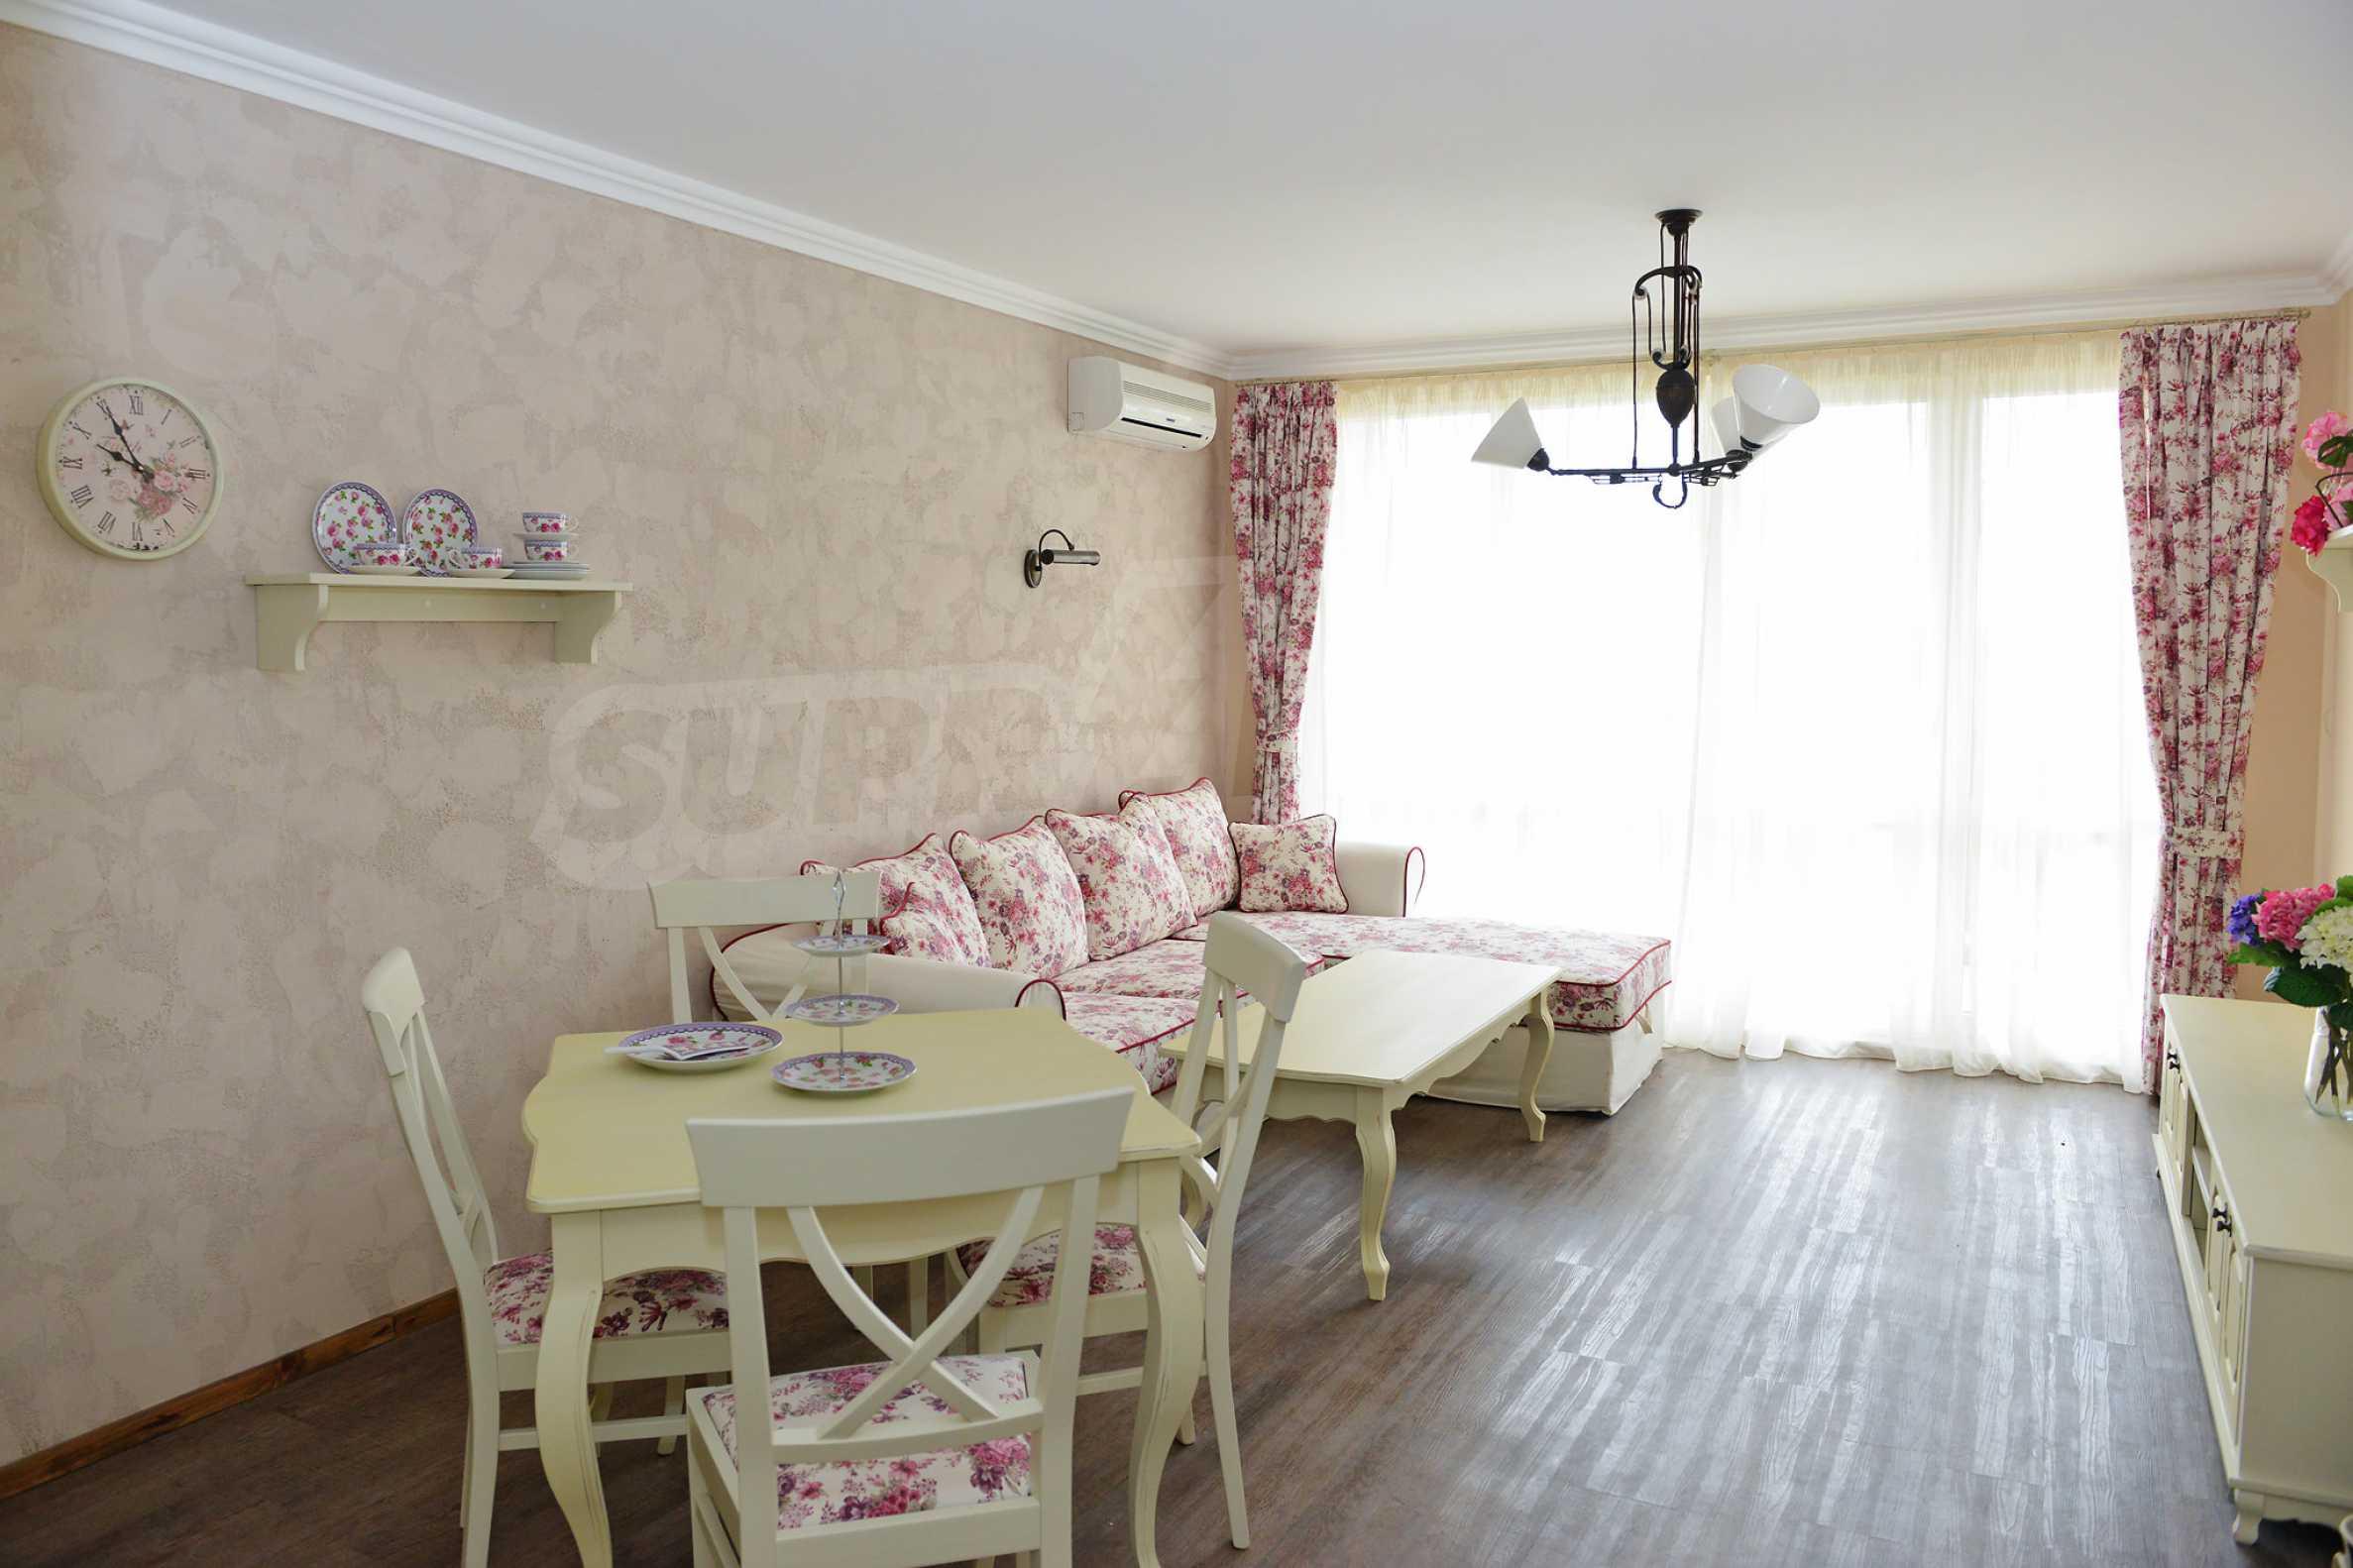 New apartment complex Atia resort in Chernomorets 27